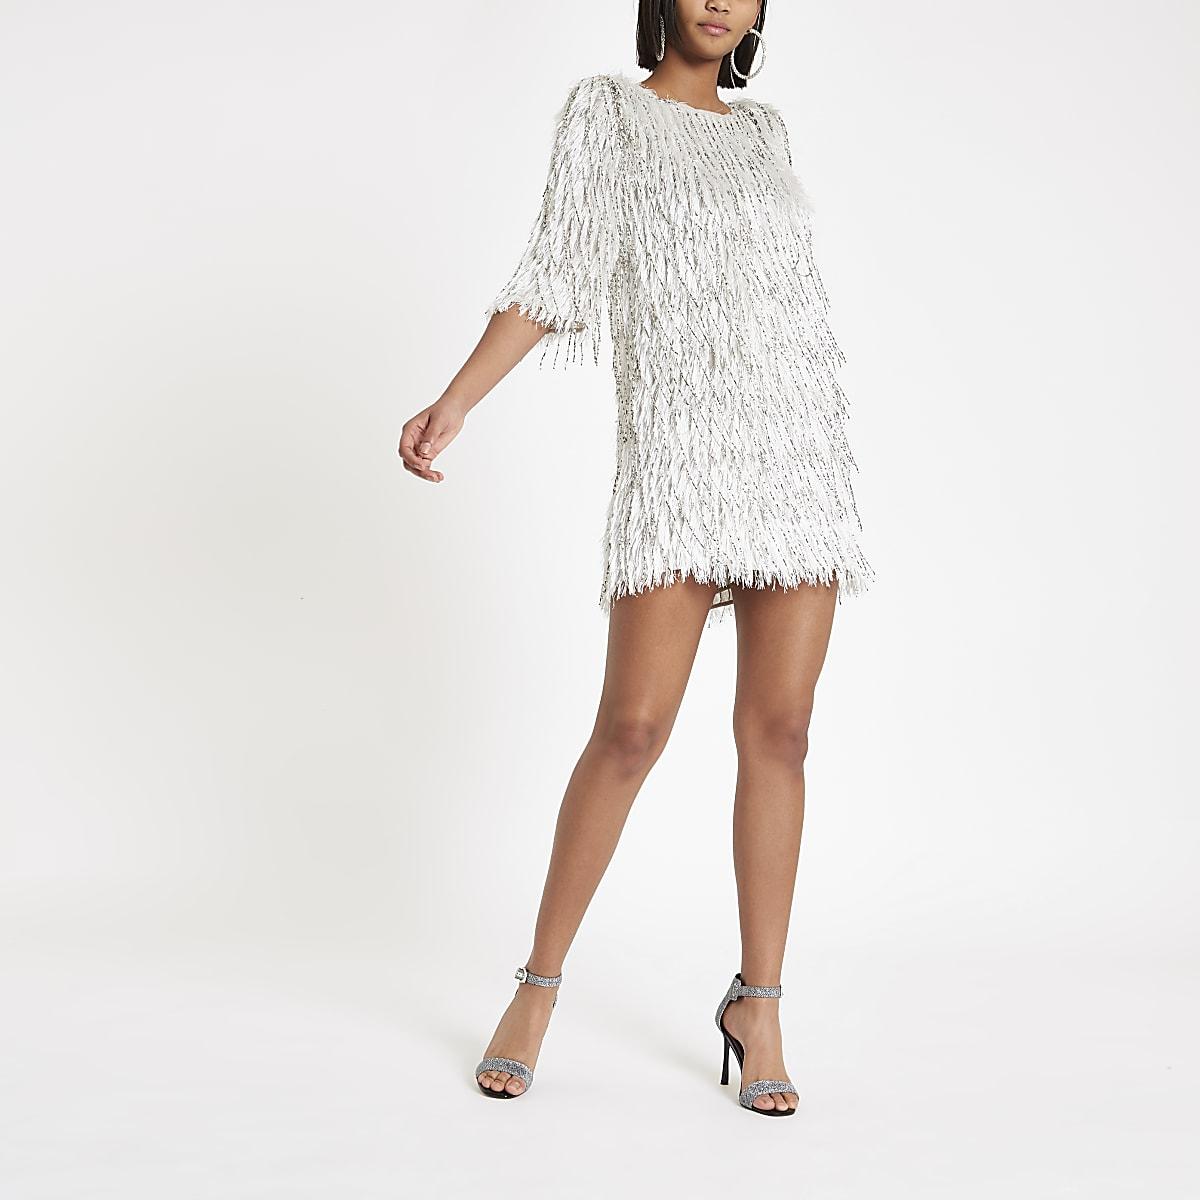 fb3e5928 Silver sequin embellished fringe dress - Swing Dresses - Dresses - women